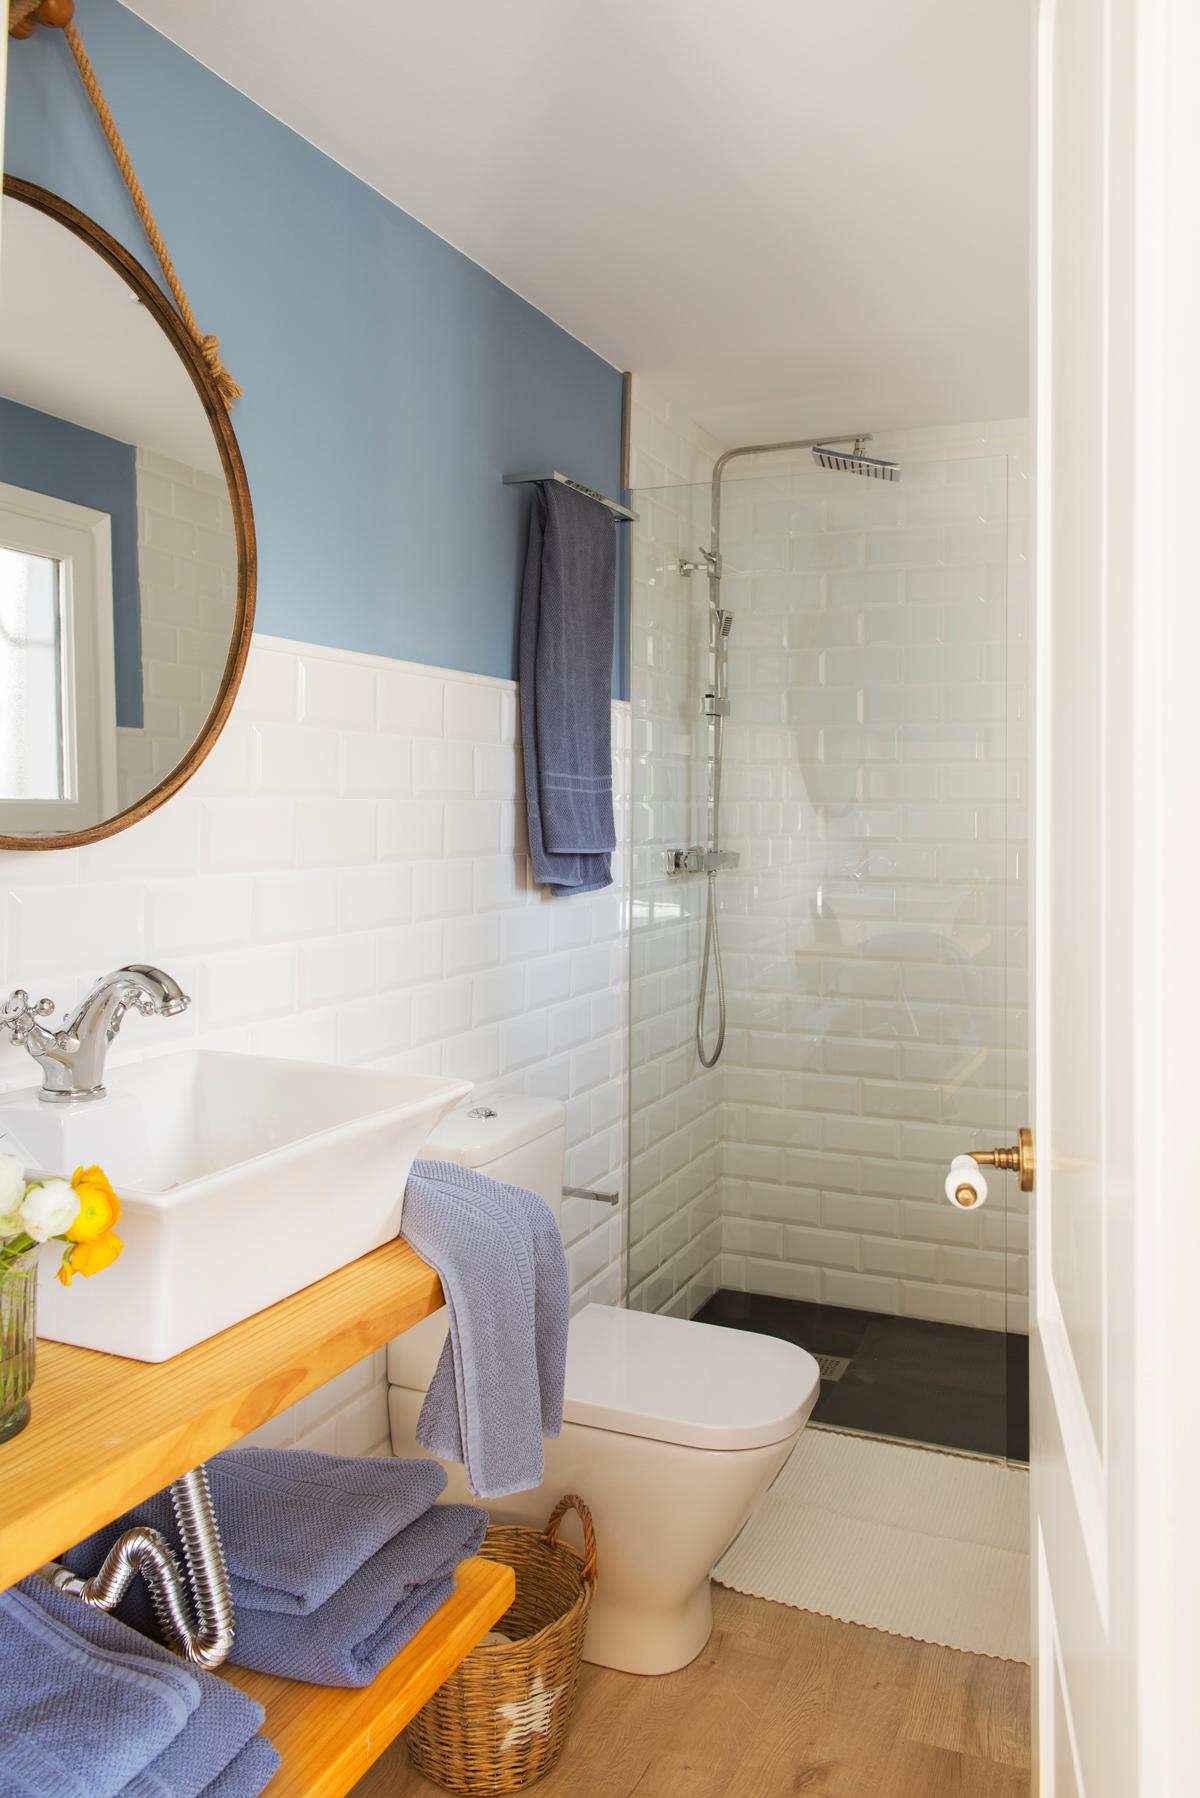 10 ideas geniales para ba os peque os - Espejo para ducha ...